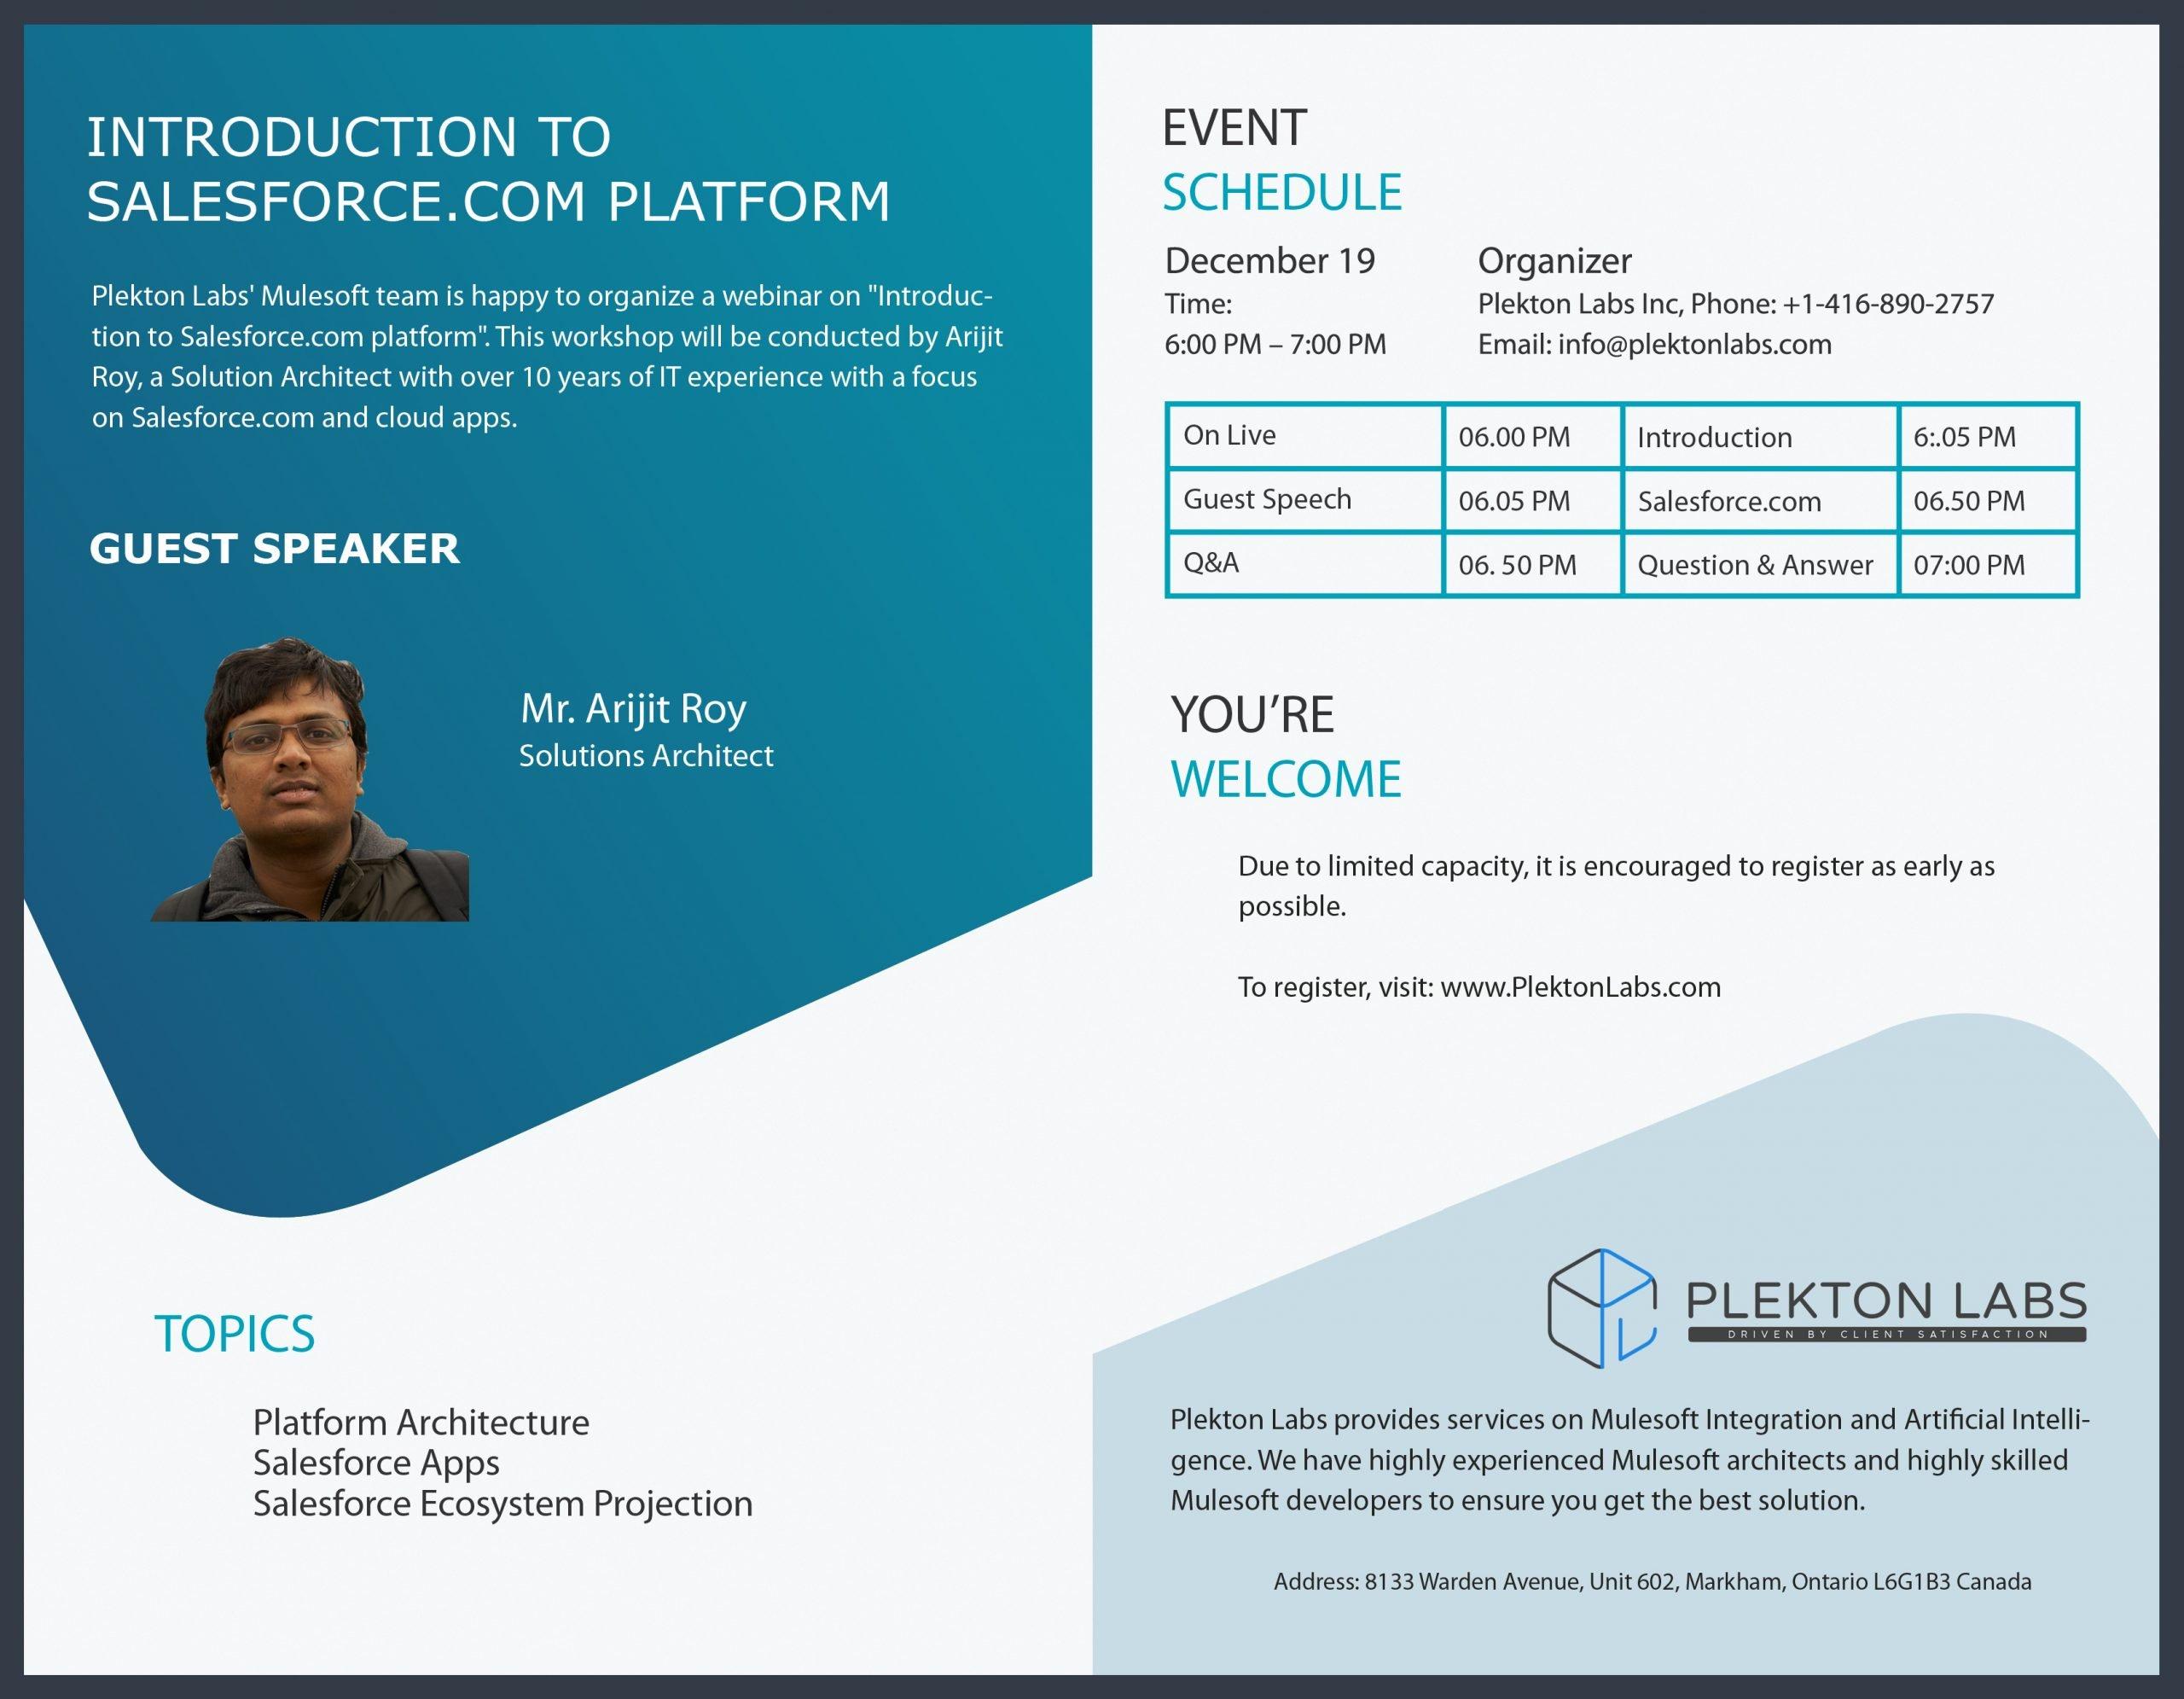 Plekton Labs Inc. is organizing the webinar – Introduction to the Salsforce.com Platform